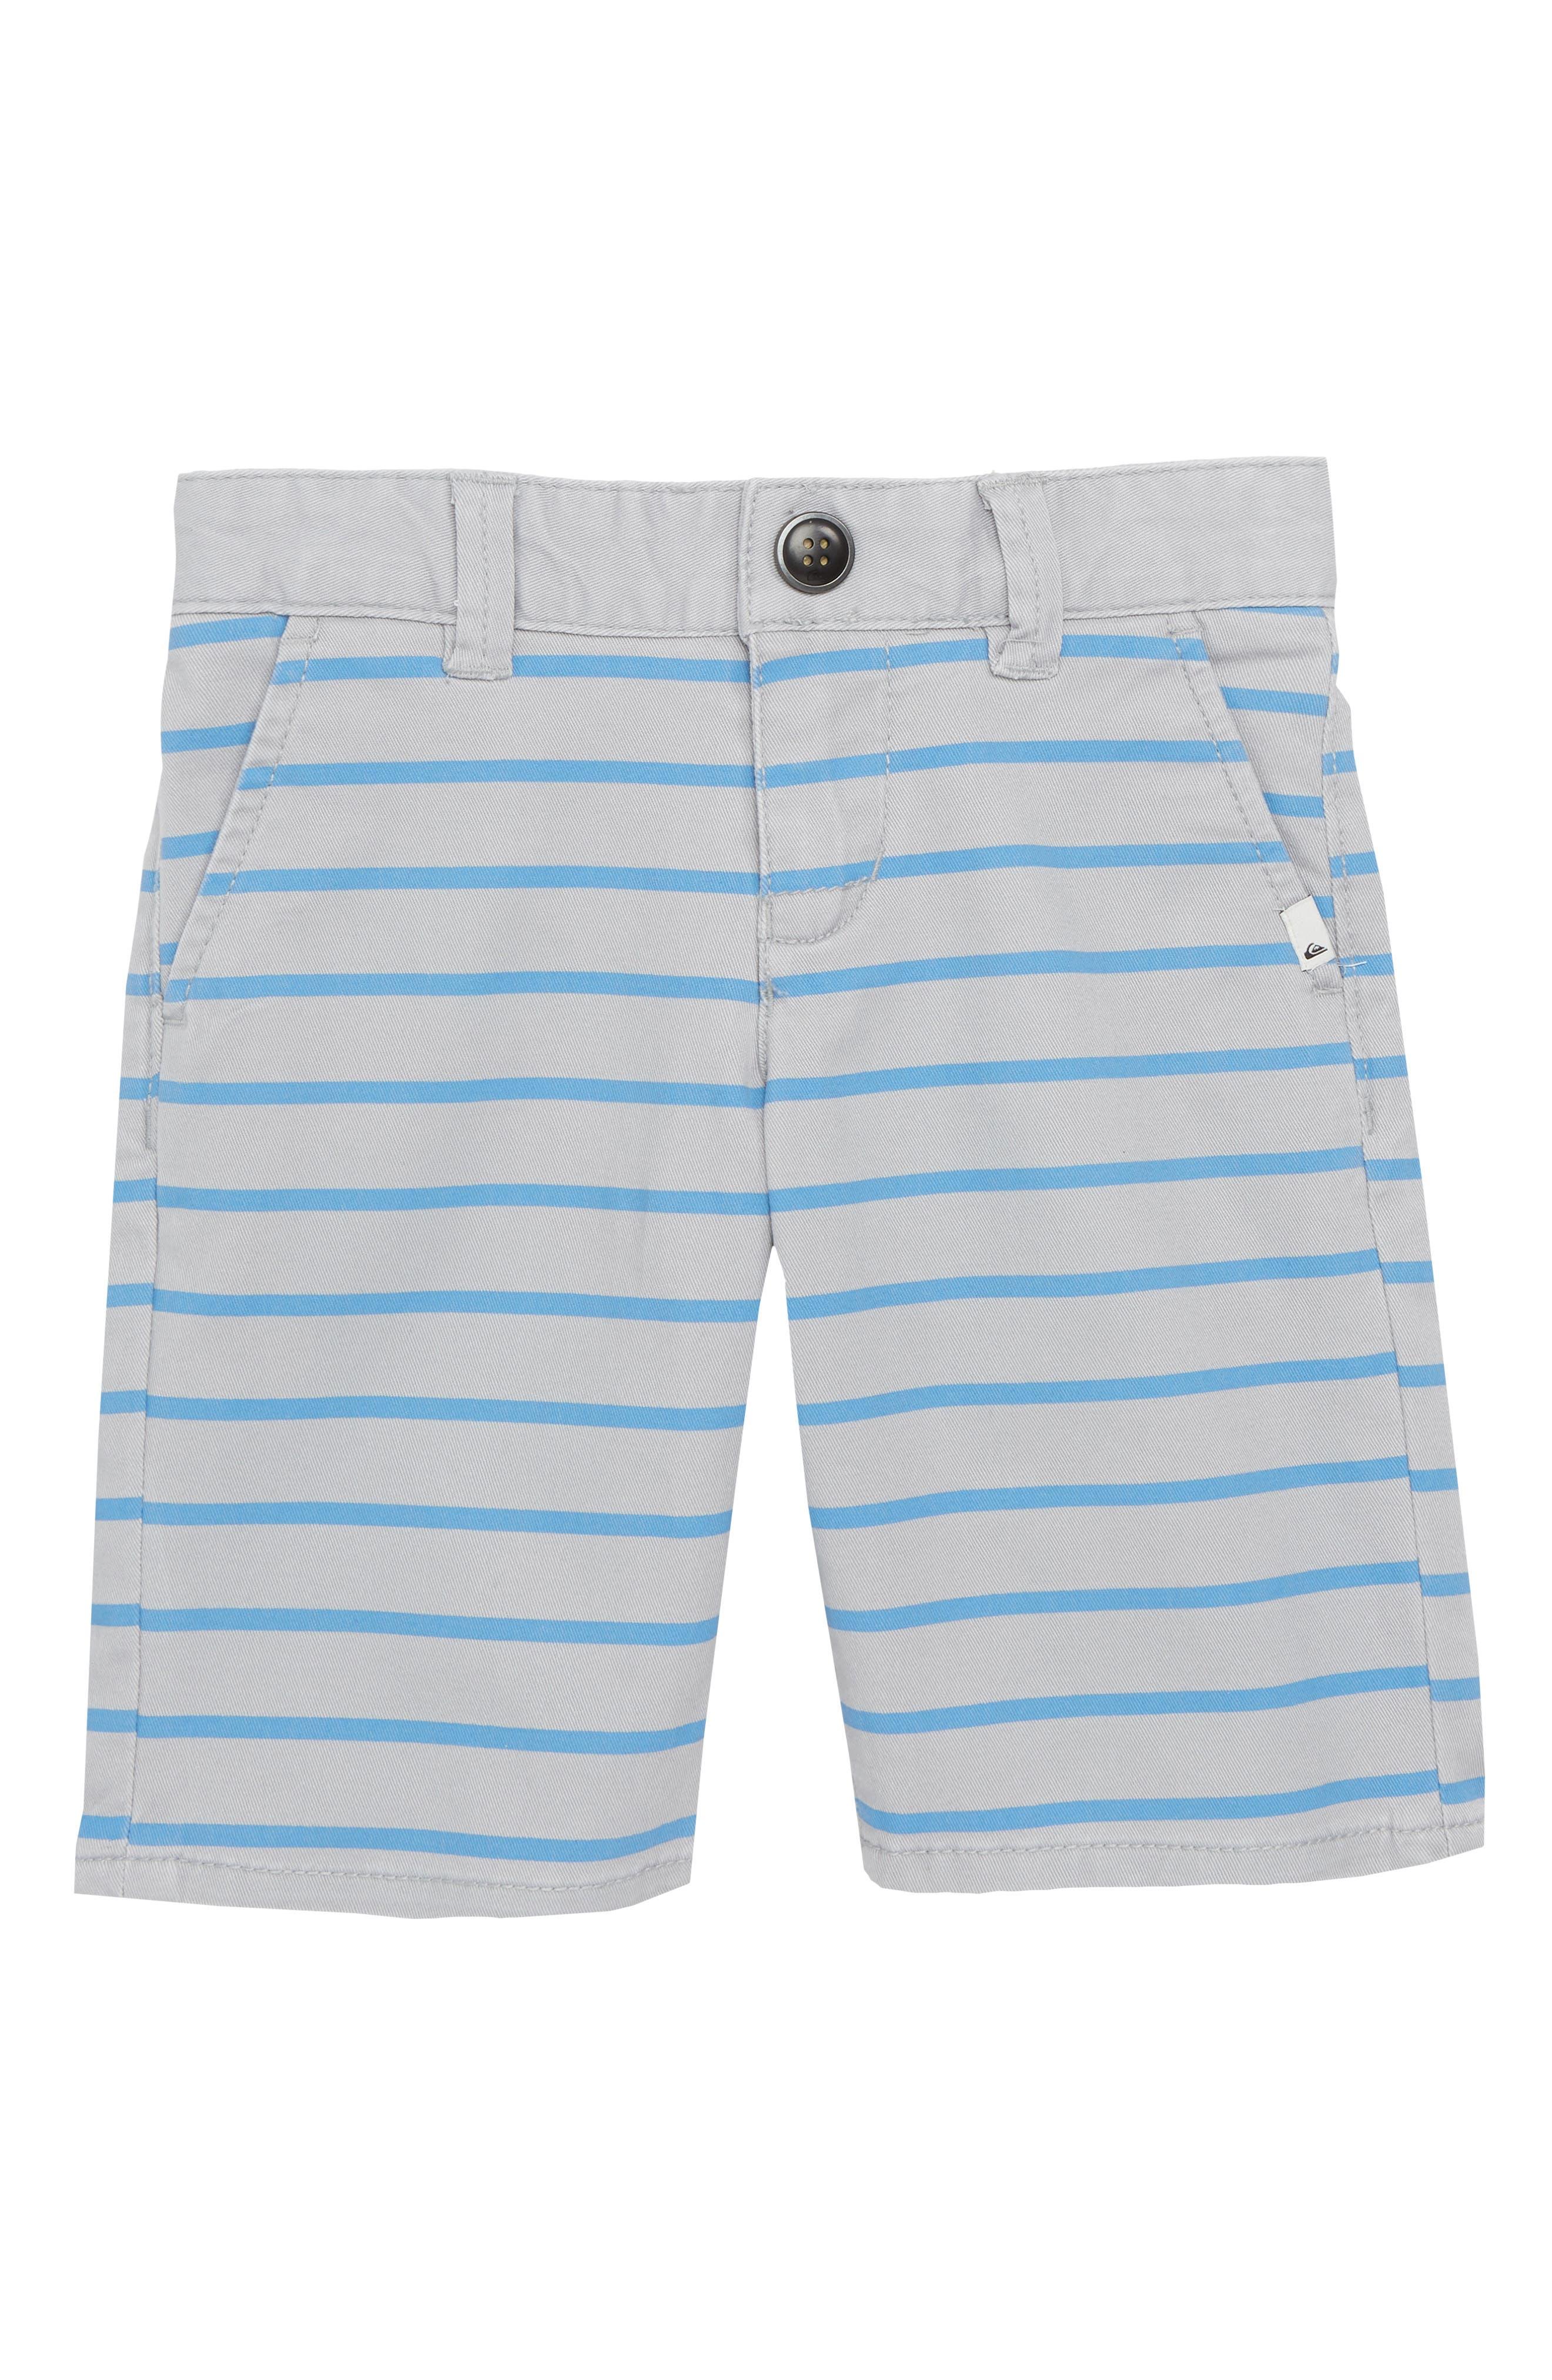 Waiku Stripe Shorts,                         Main,                         color, 031